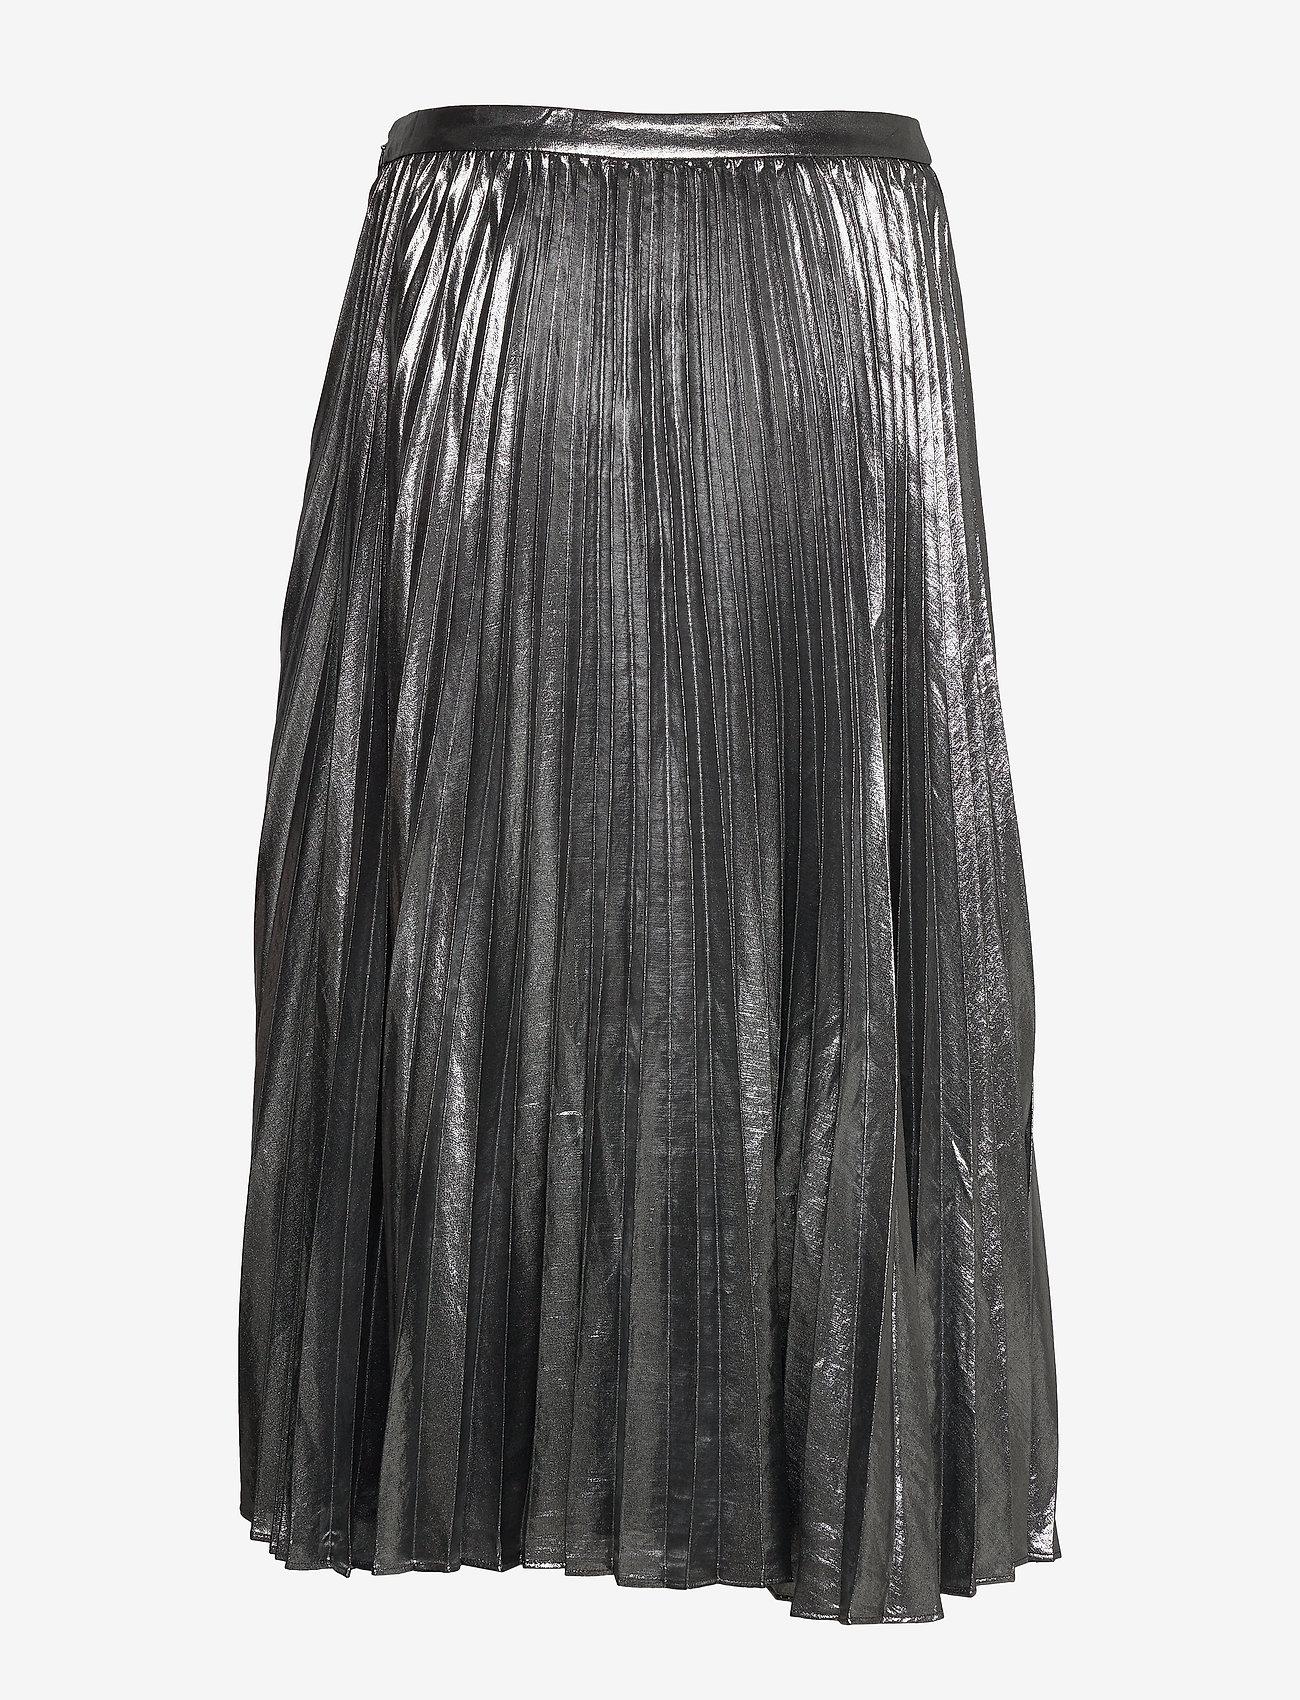 Banana Republic - Metallic Pleated Midi Skirt - midi skirts - dark charcoal - 1